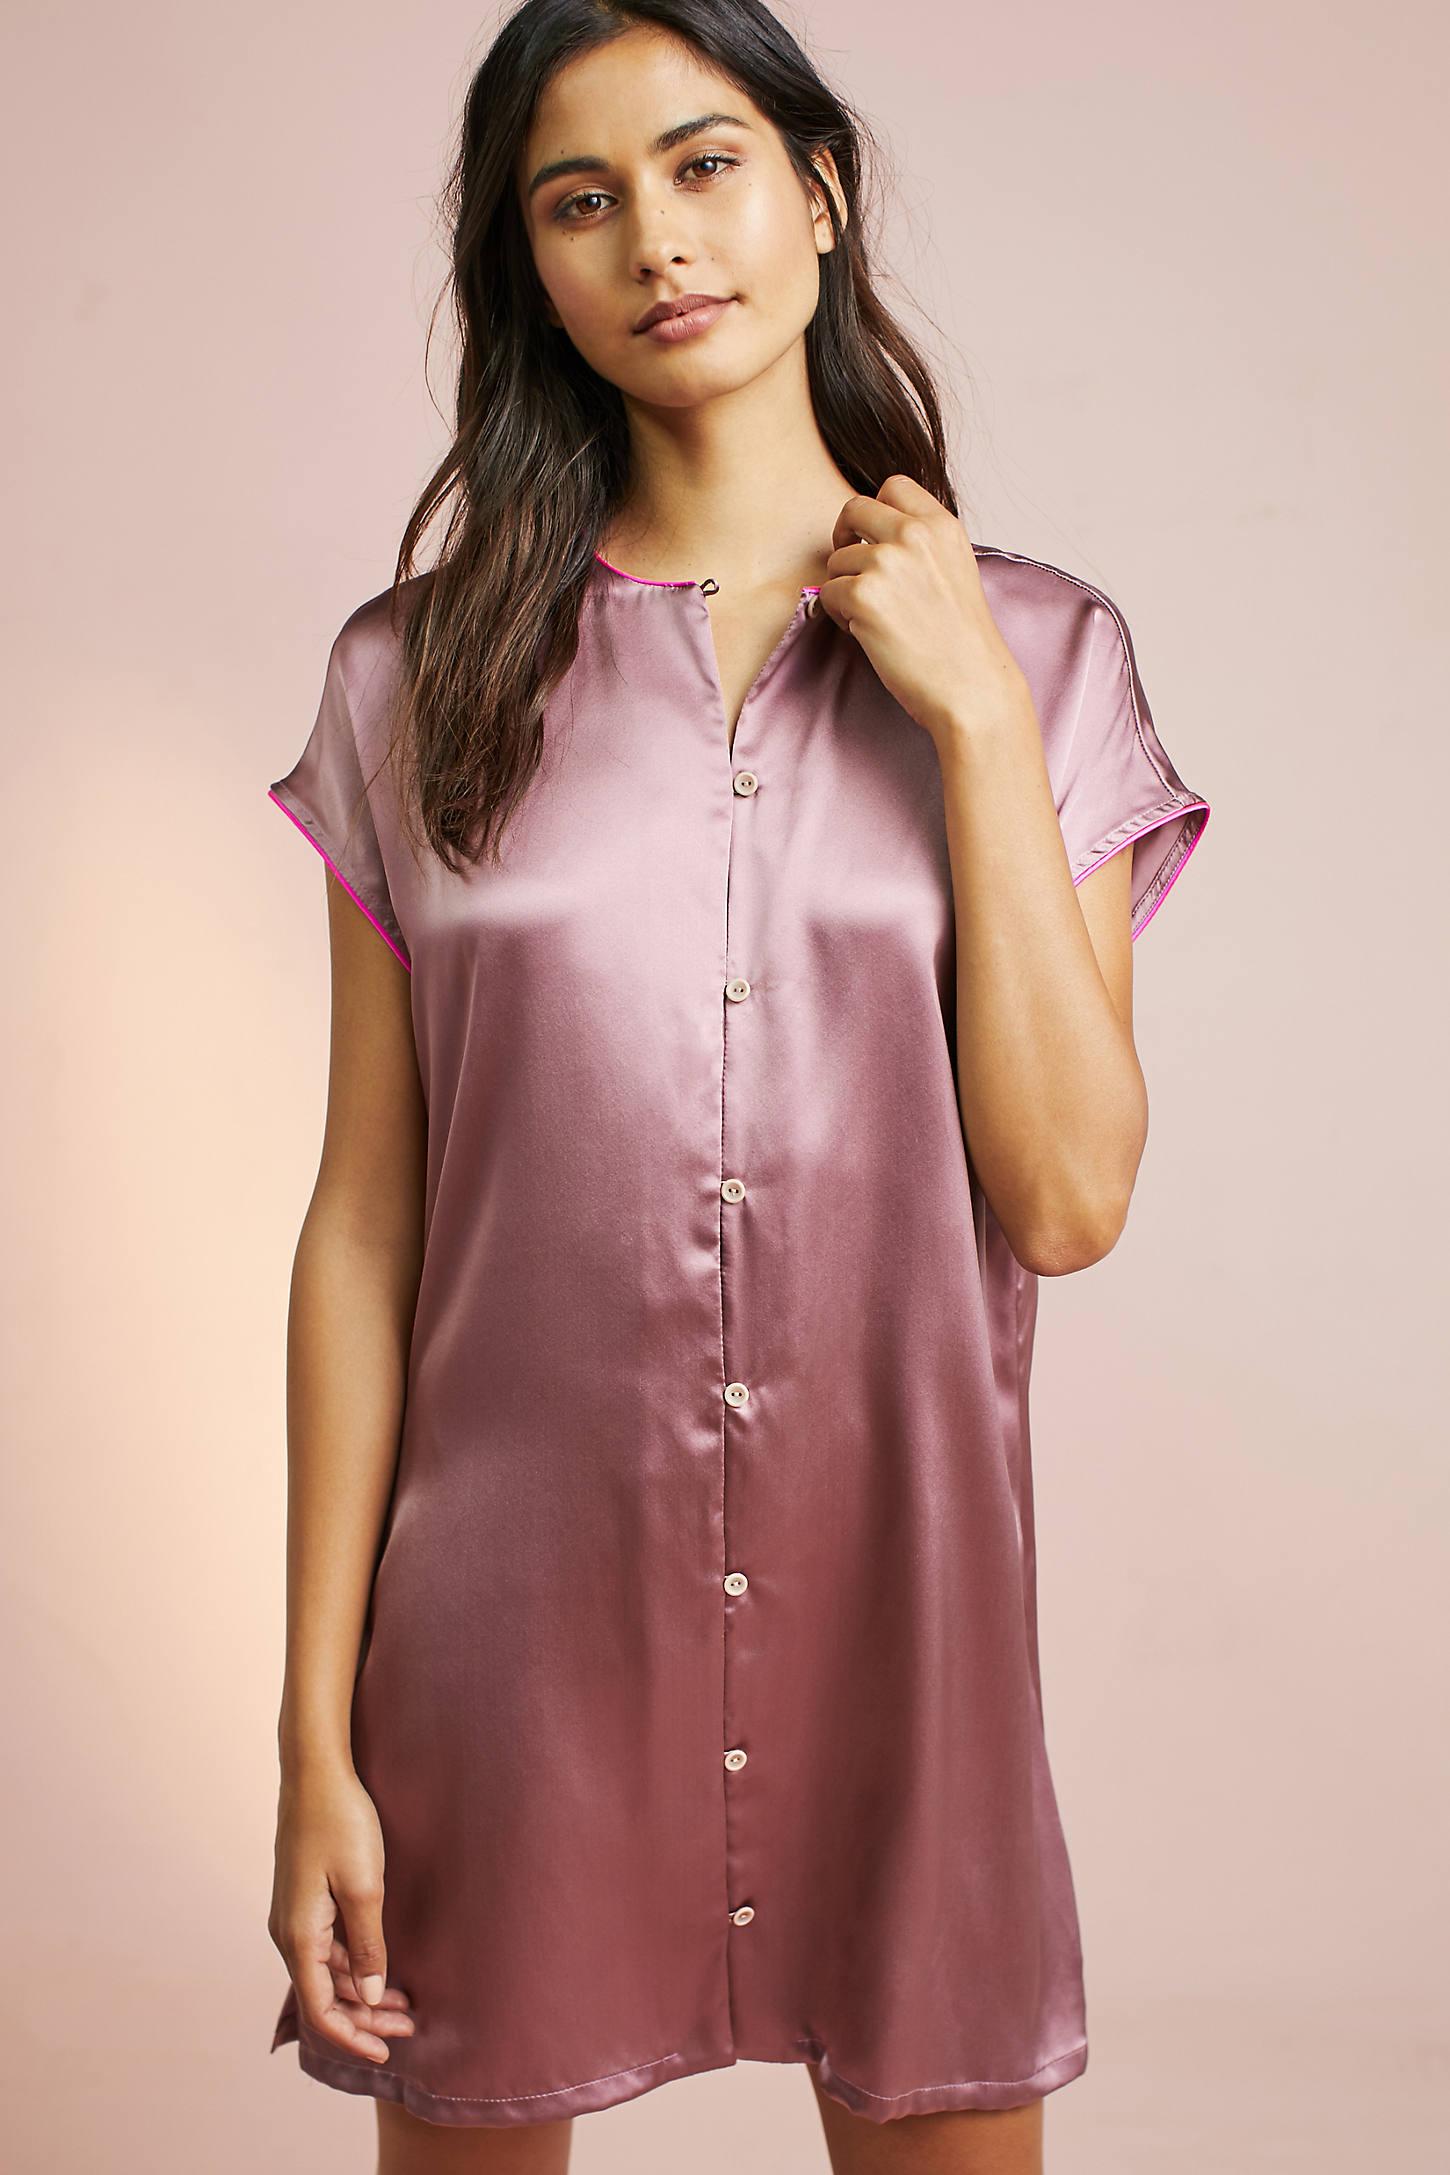 Corey Lynn Calter Mallory Silk Sleep Shirtdress